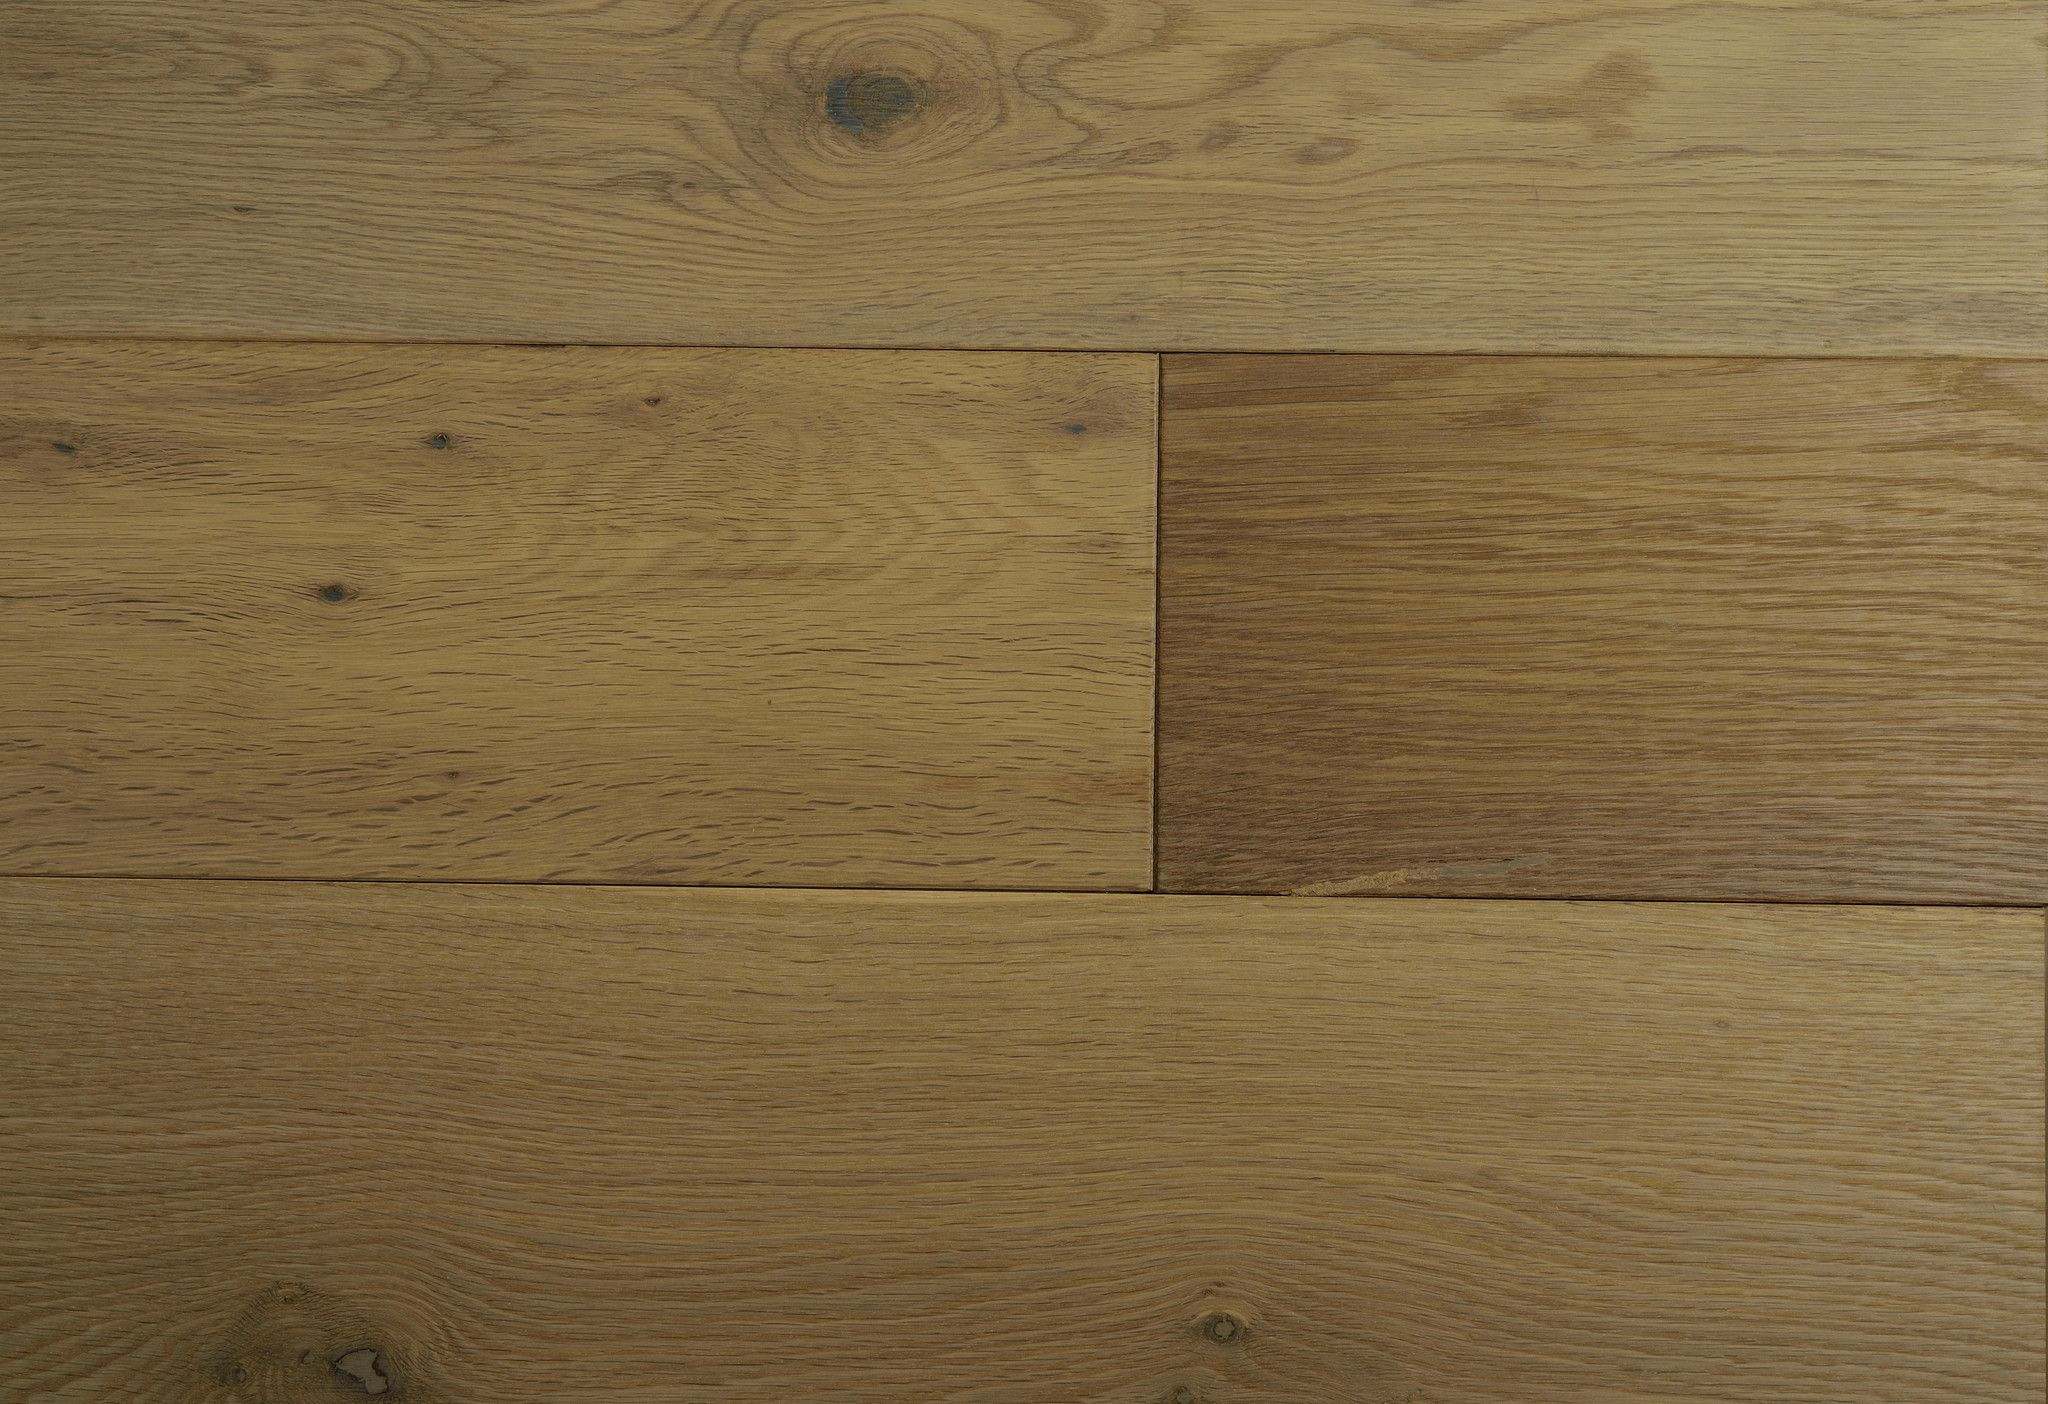 25 Popular 3 Oak Hardwood Flooring 2021 free download 3 oak hardwood flooring of everbrite white oak smoked solid 3 4 white oak wax and products regarding everbrite white oak smoked solid 3 4